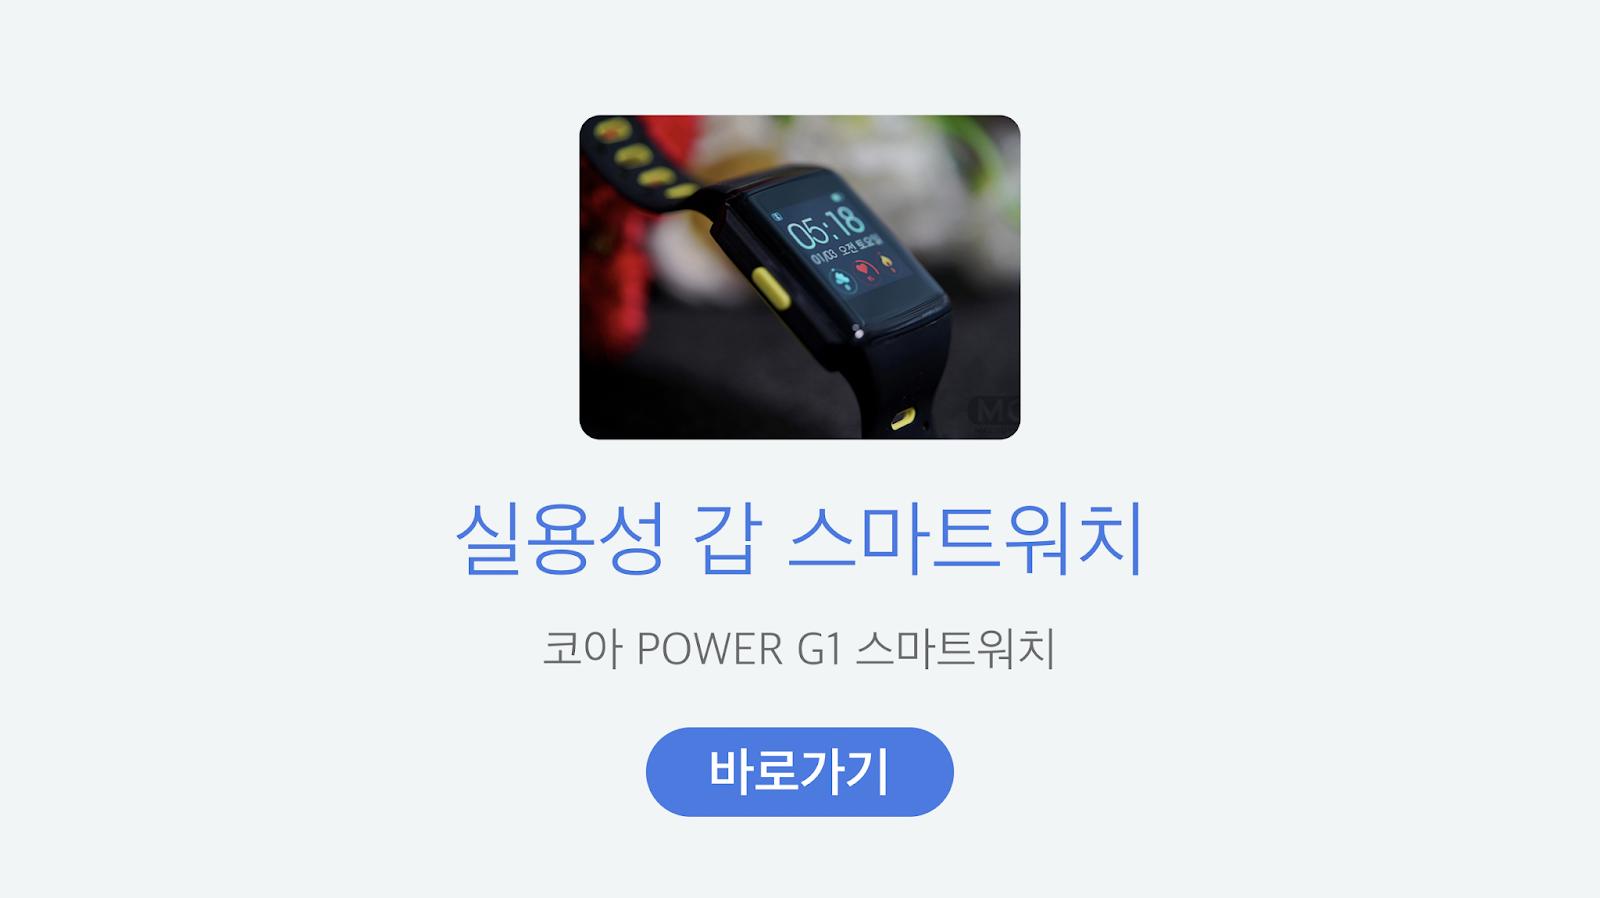 https://smartstore.naver.com/enjoycoa/products/4707186118